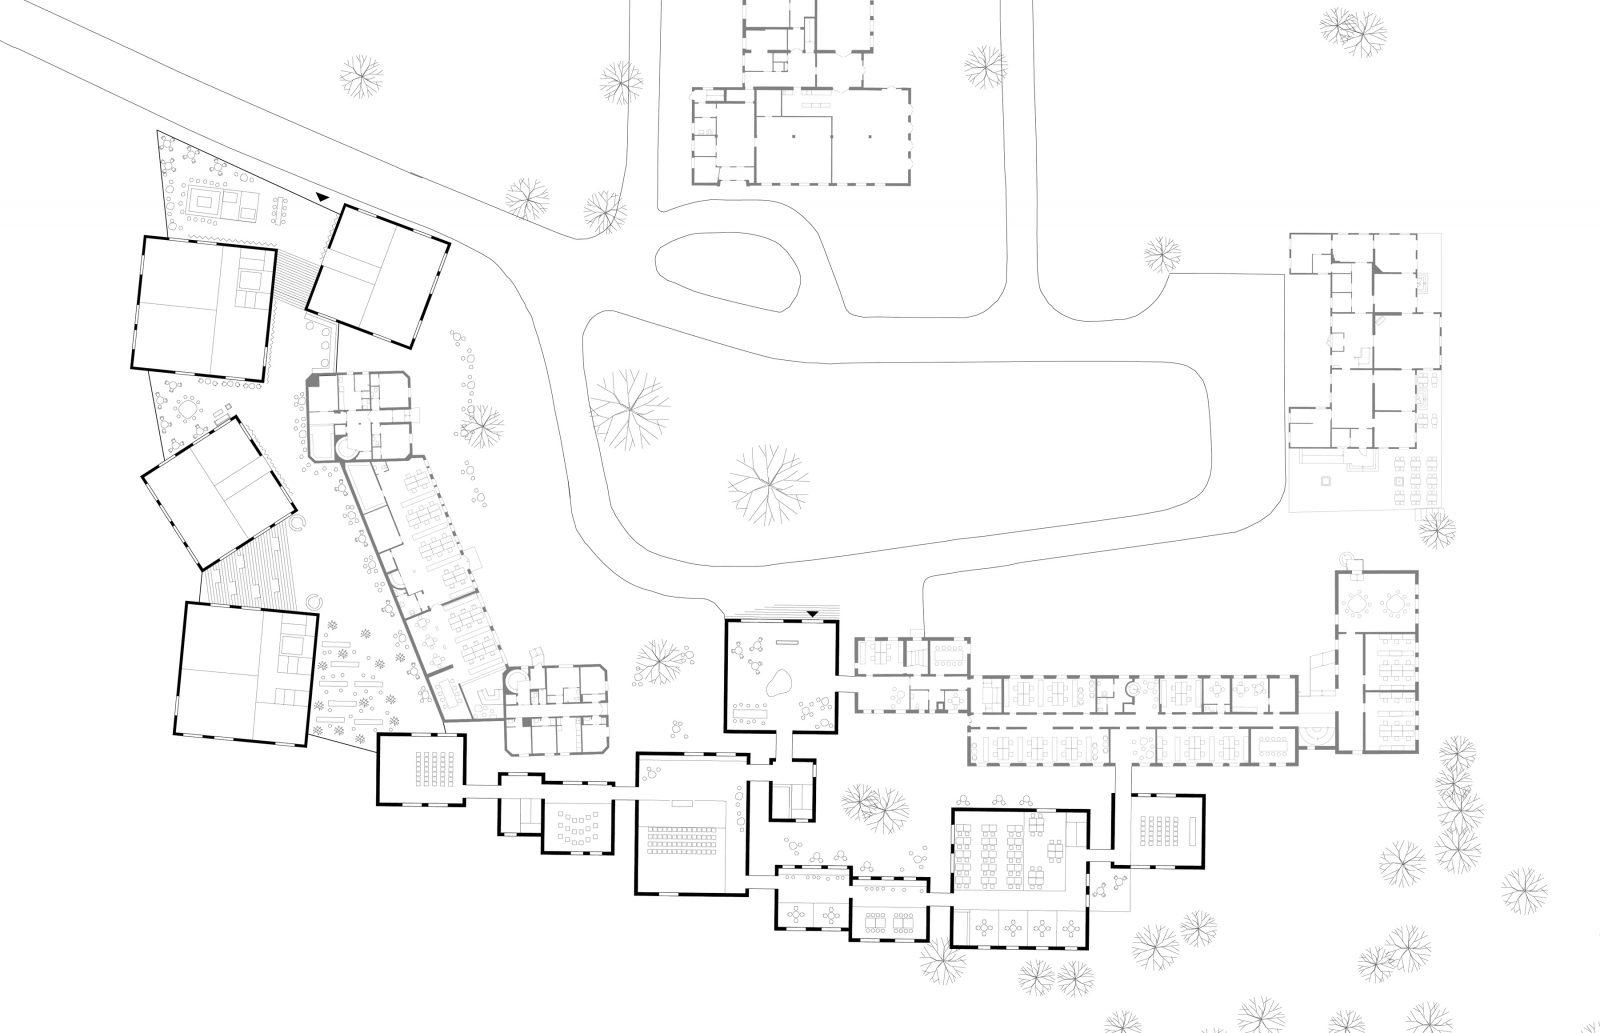 KjellanderSjöberg Högskolan StoraSköndal plan 3600x2324px